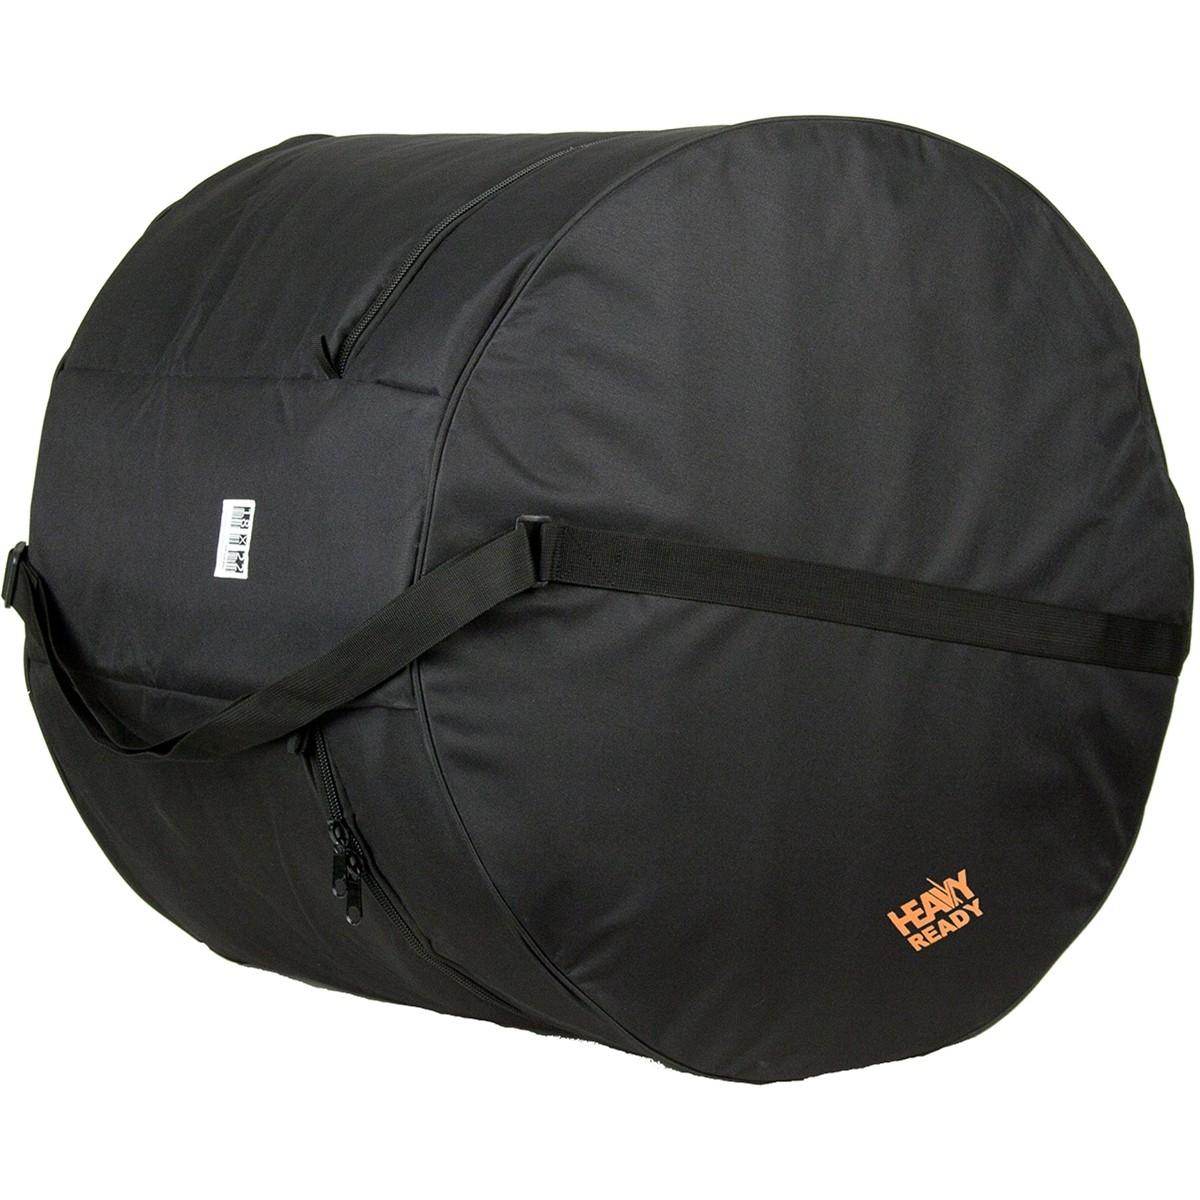 Protec Heavy Ready Series Padded Kick Drum Bag 18″ x 22″ (HR1822)